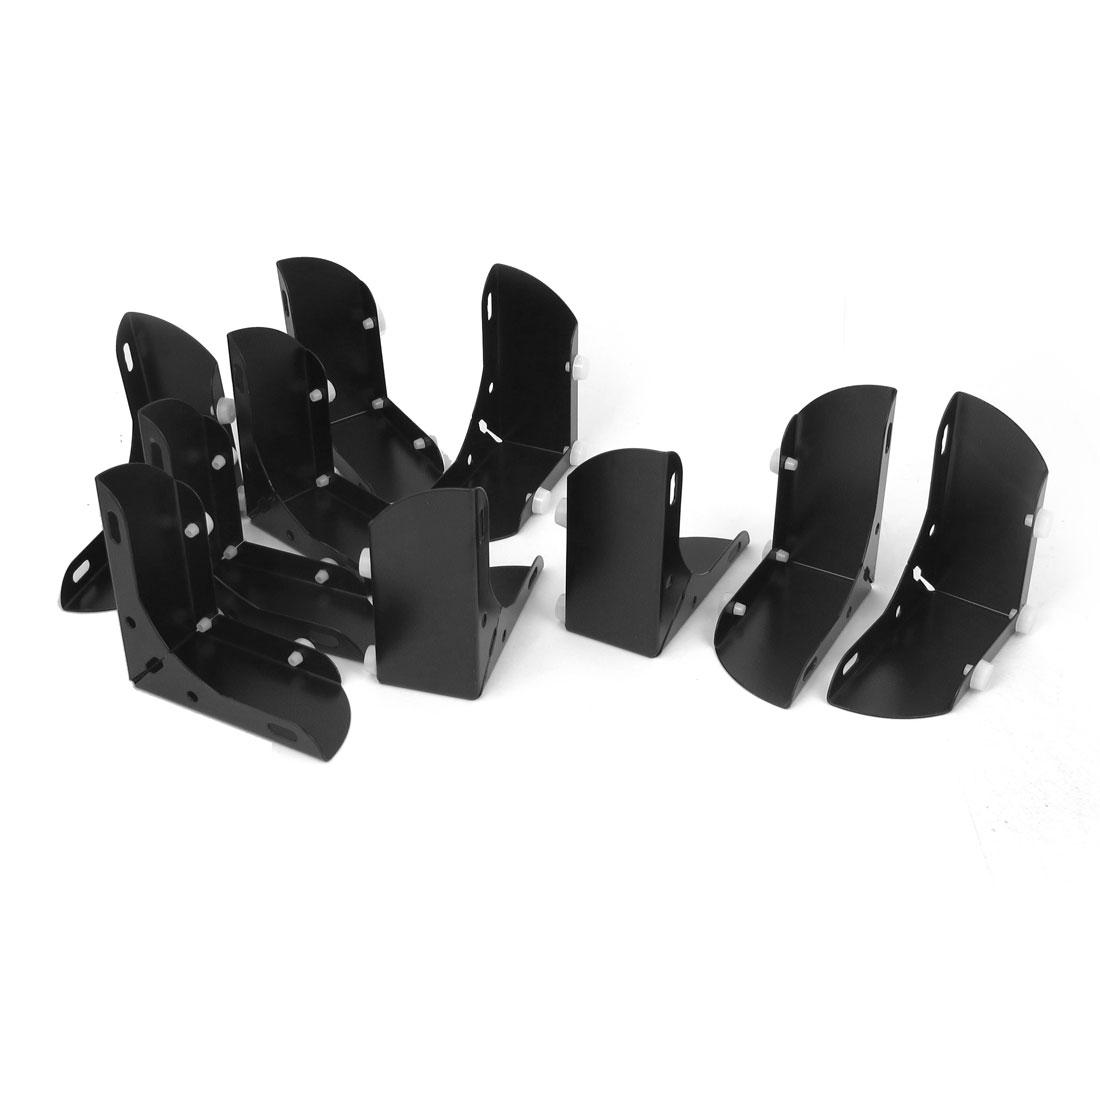 46mm Inner Height Furniture Feet Cabinet Sofa Leg Decor Black 10pcs